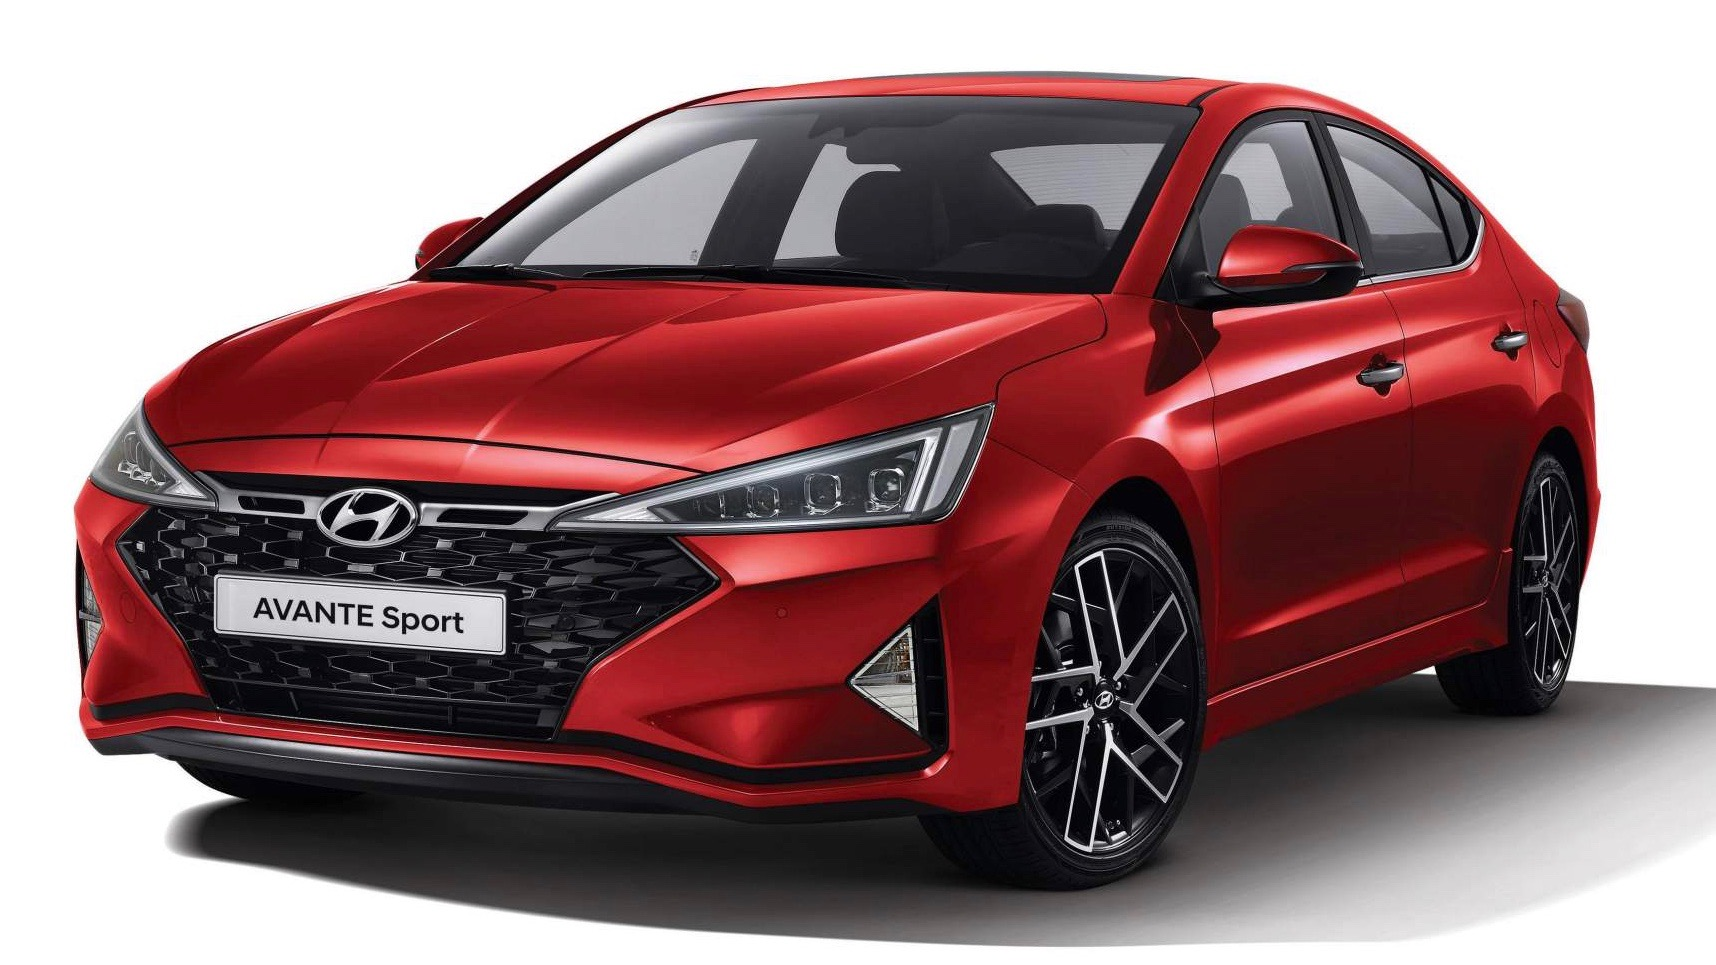 2019 Hyundai Elantra SR front red 3/4